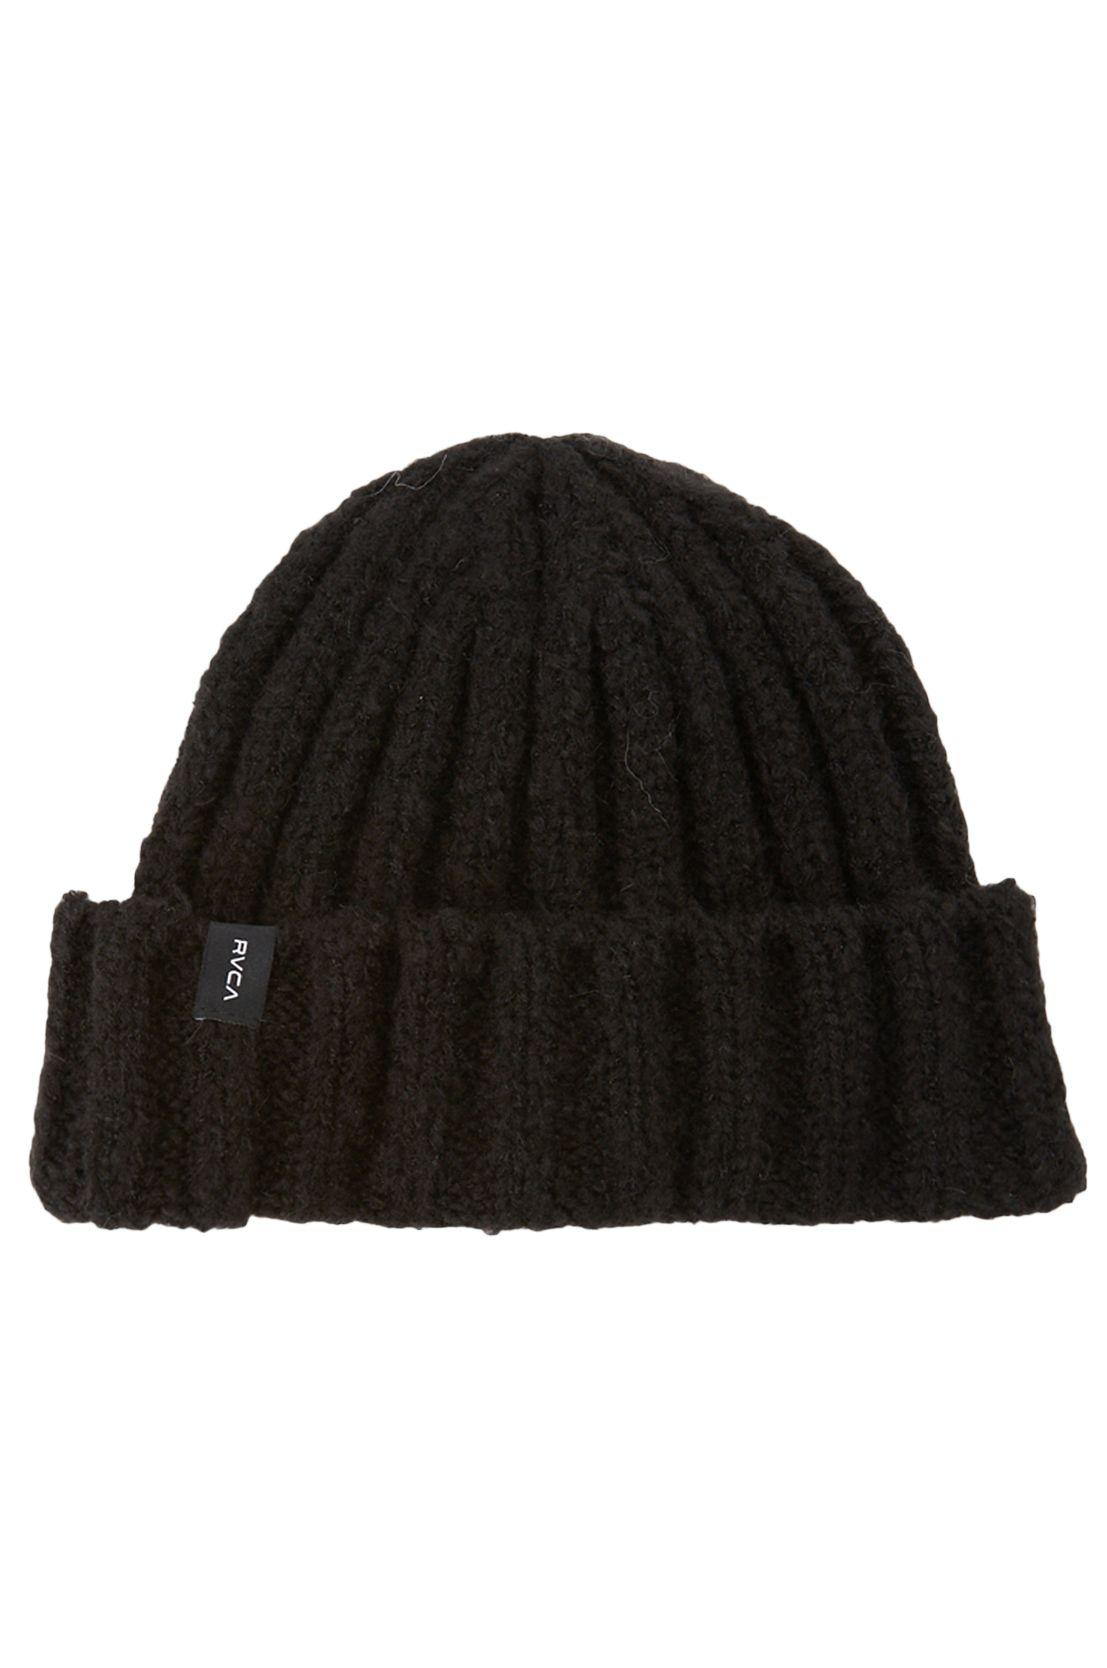 Gorro RVCA WARM EYES BEANIE True Black